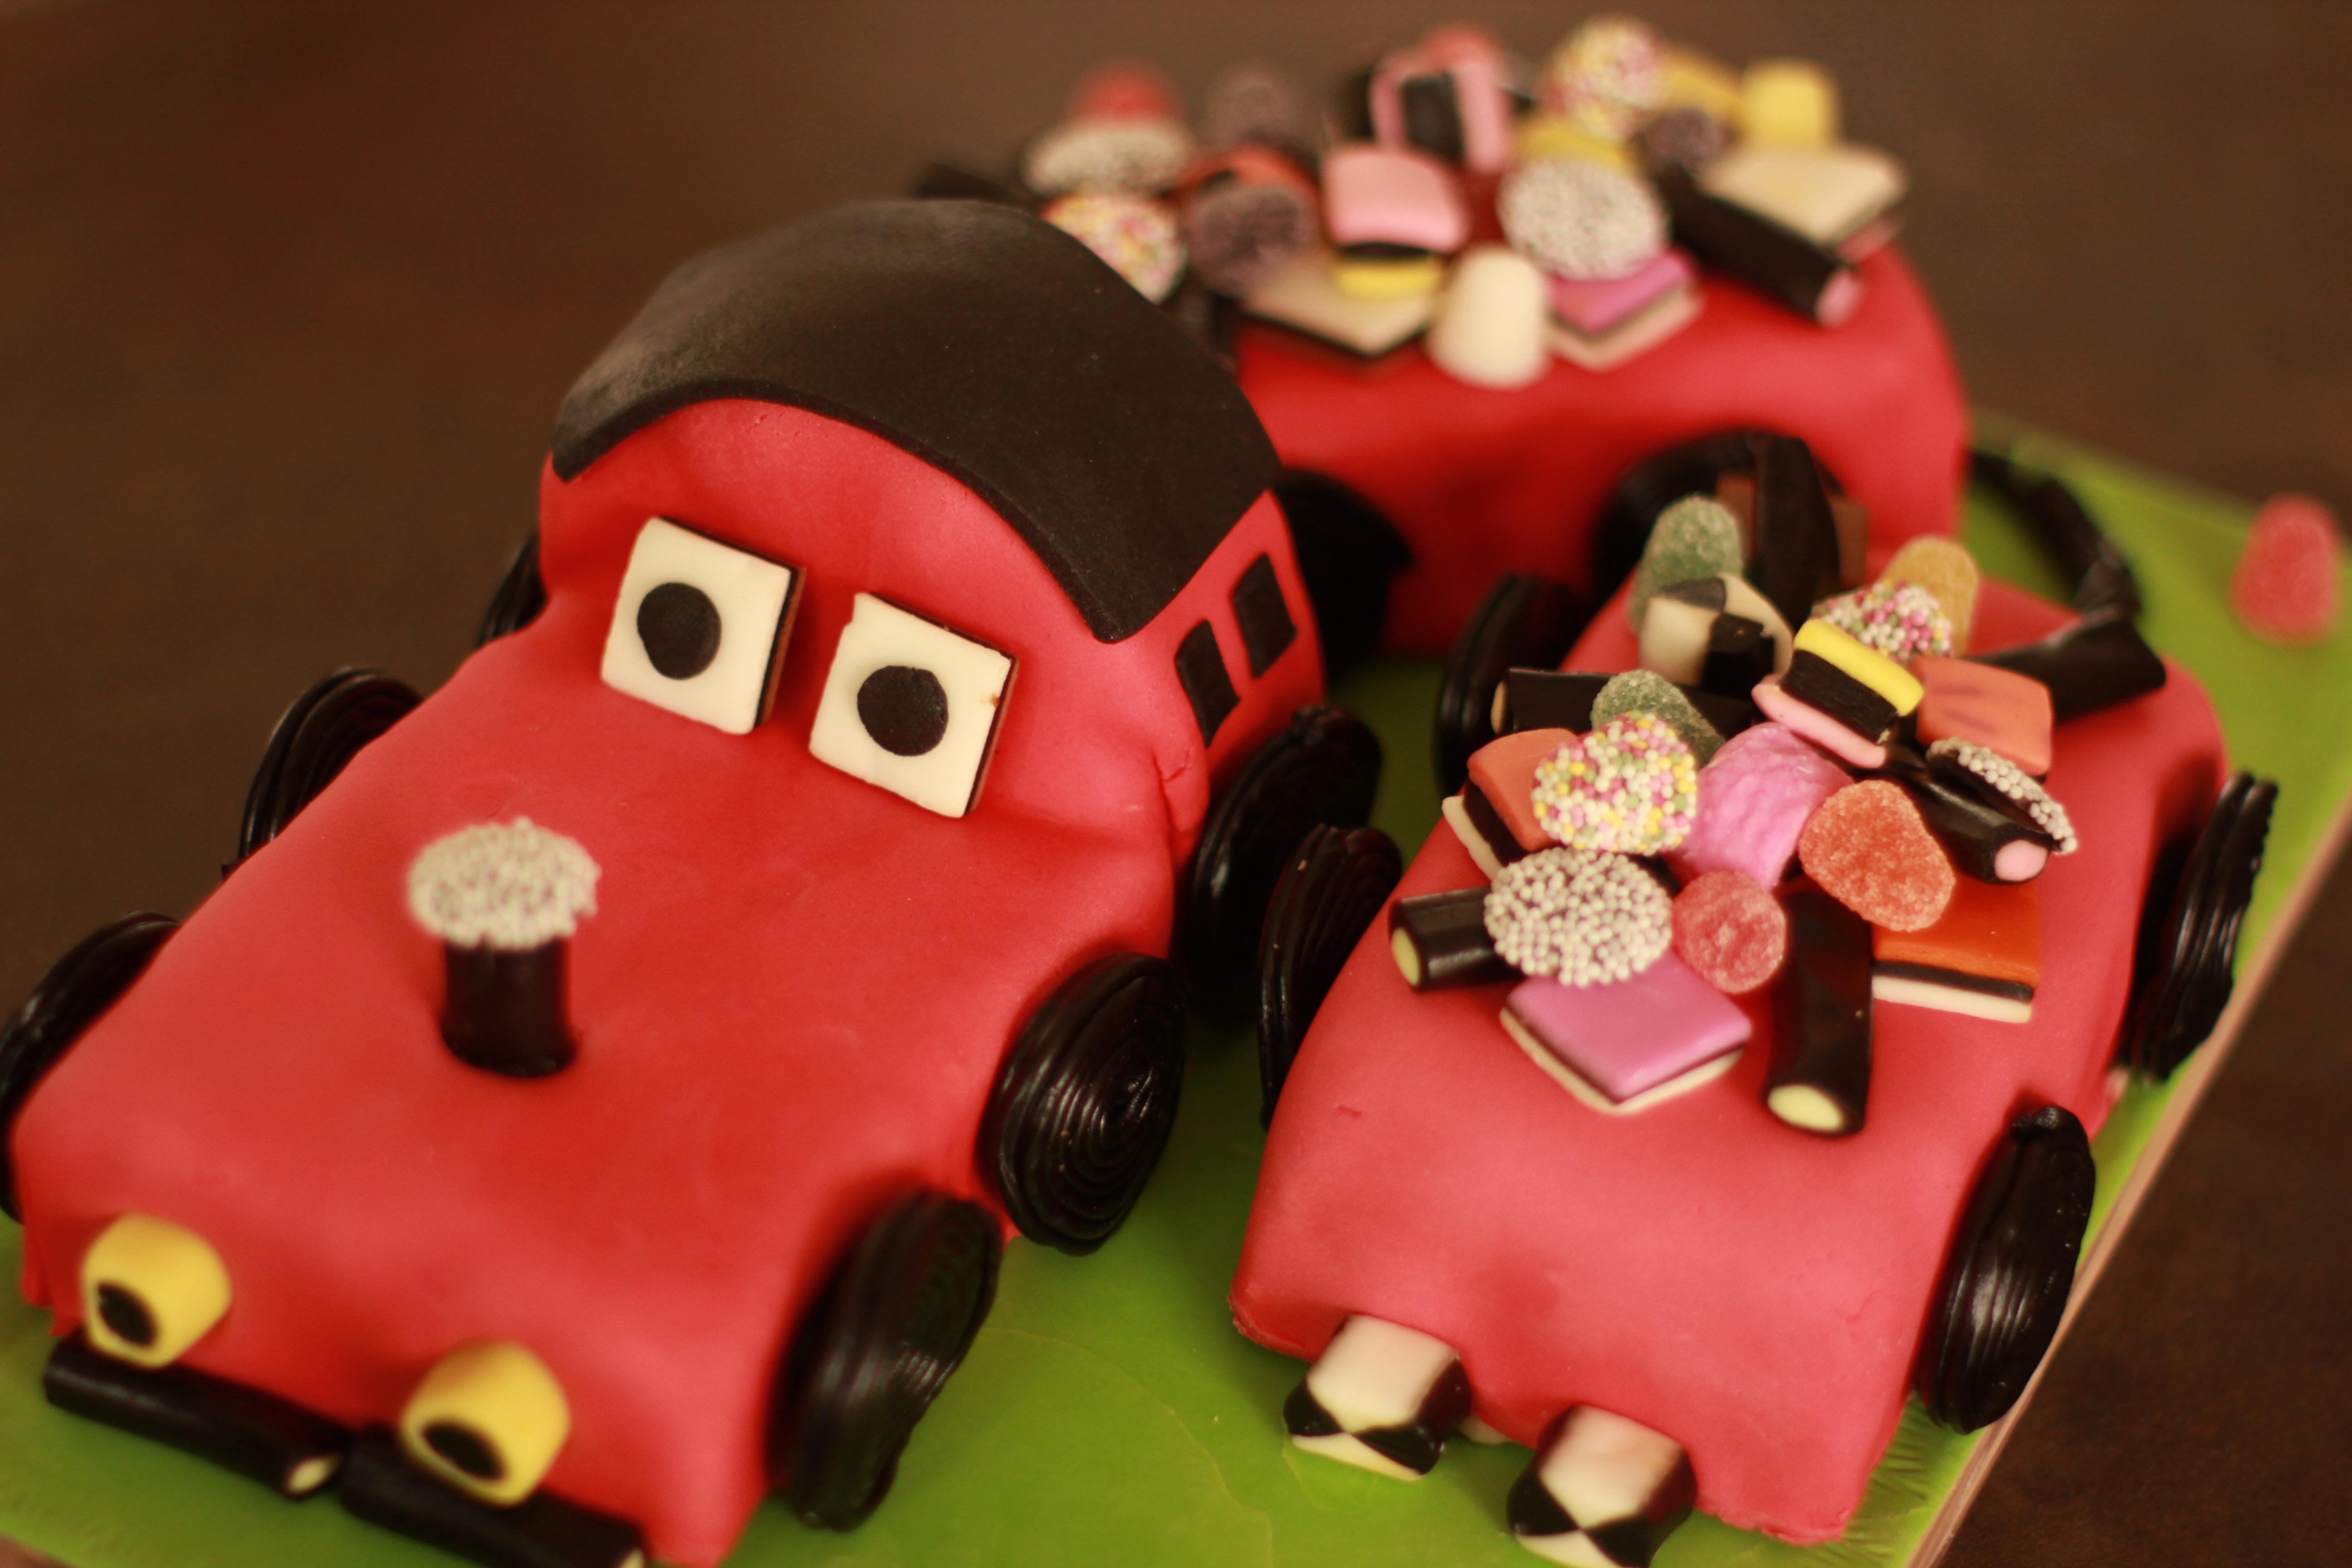 fotos gratis chico tren regalo comida rojo nio postre cocina pastel de cumpleaos festival velas formacin de hielo globos caramelo